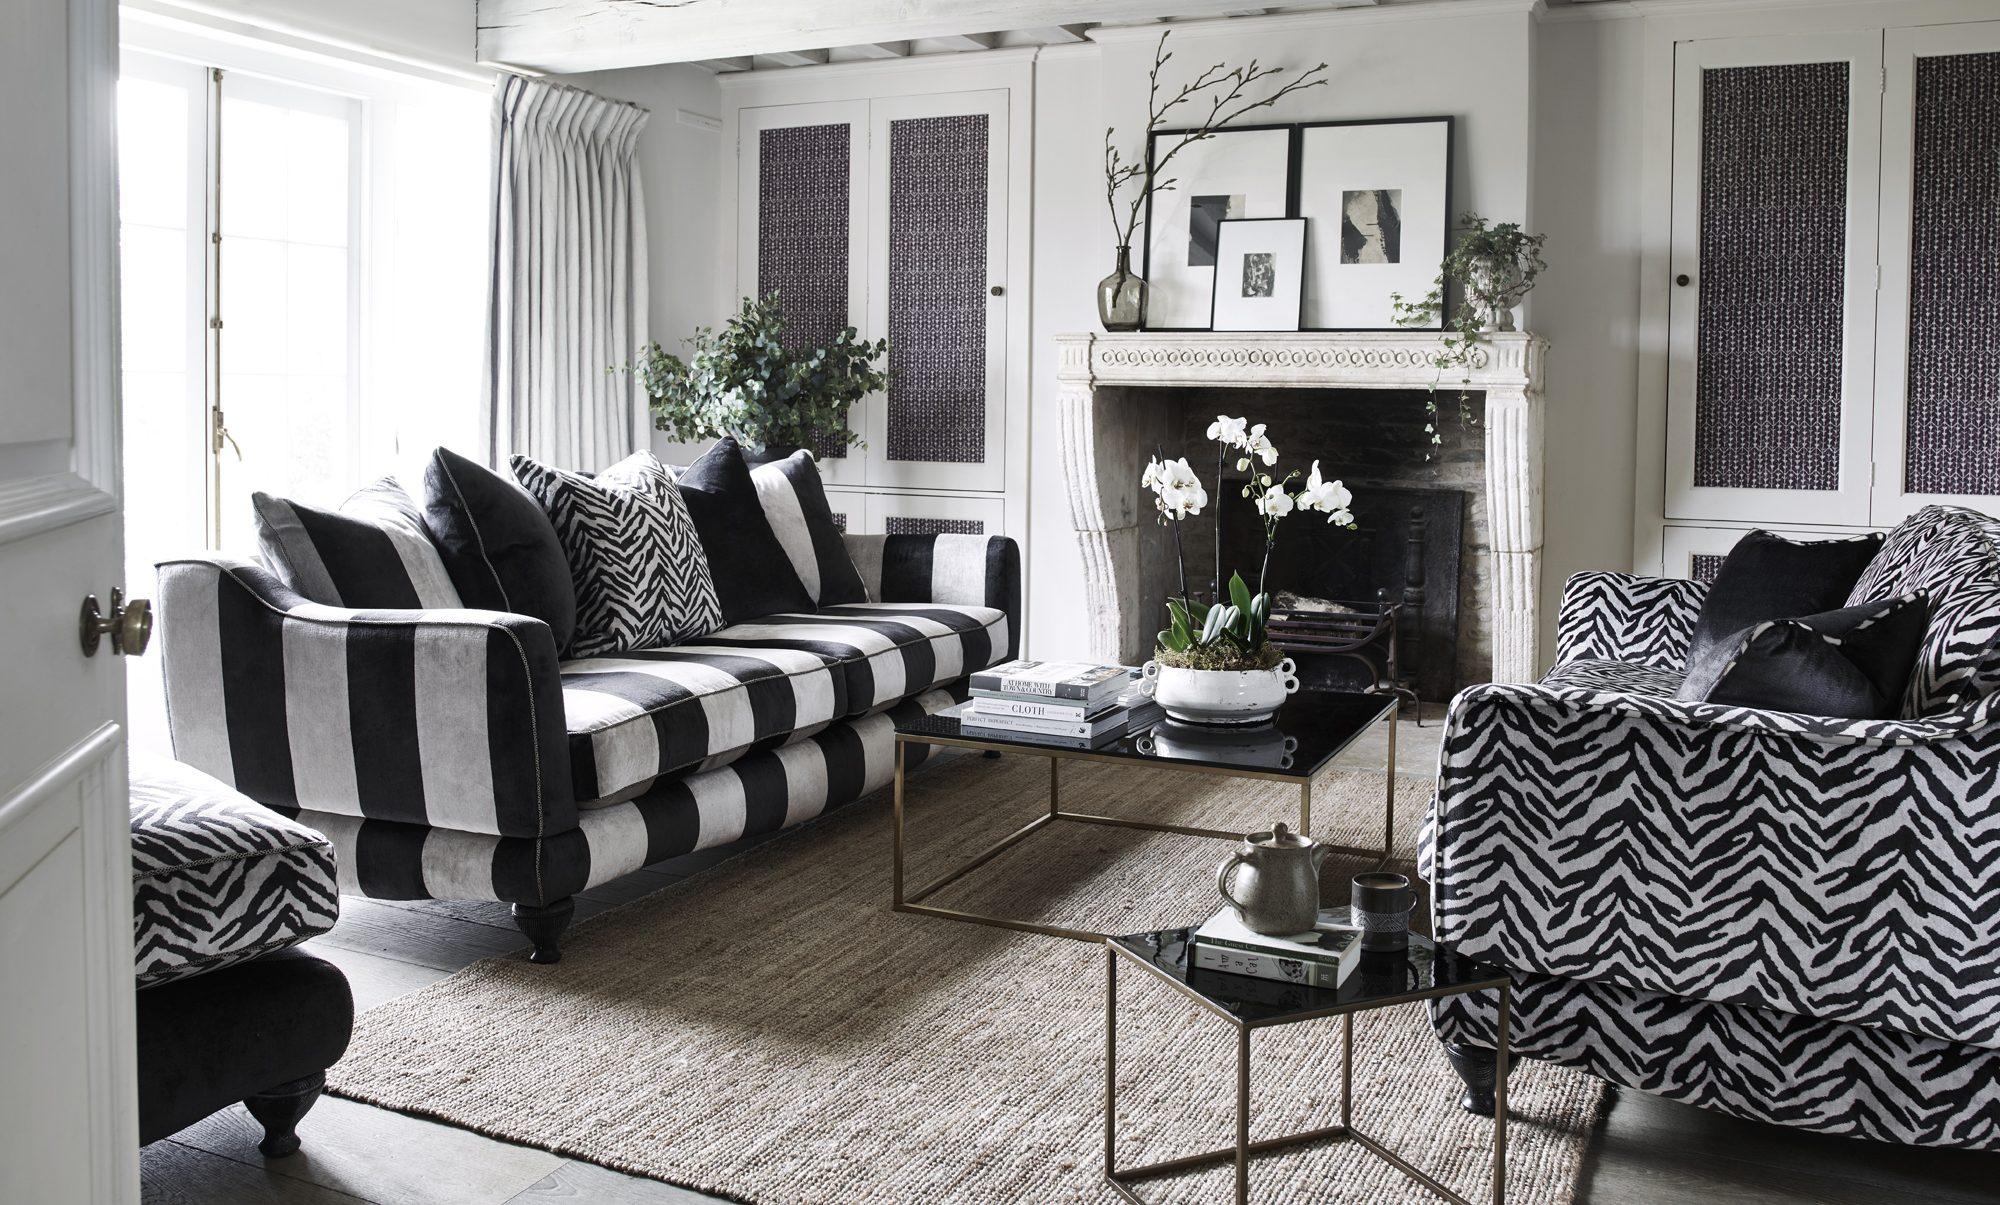 Image result for British inspired furniture